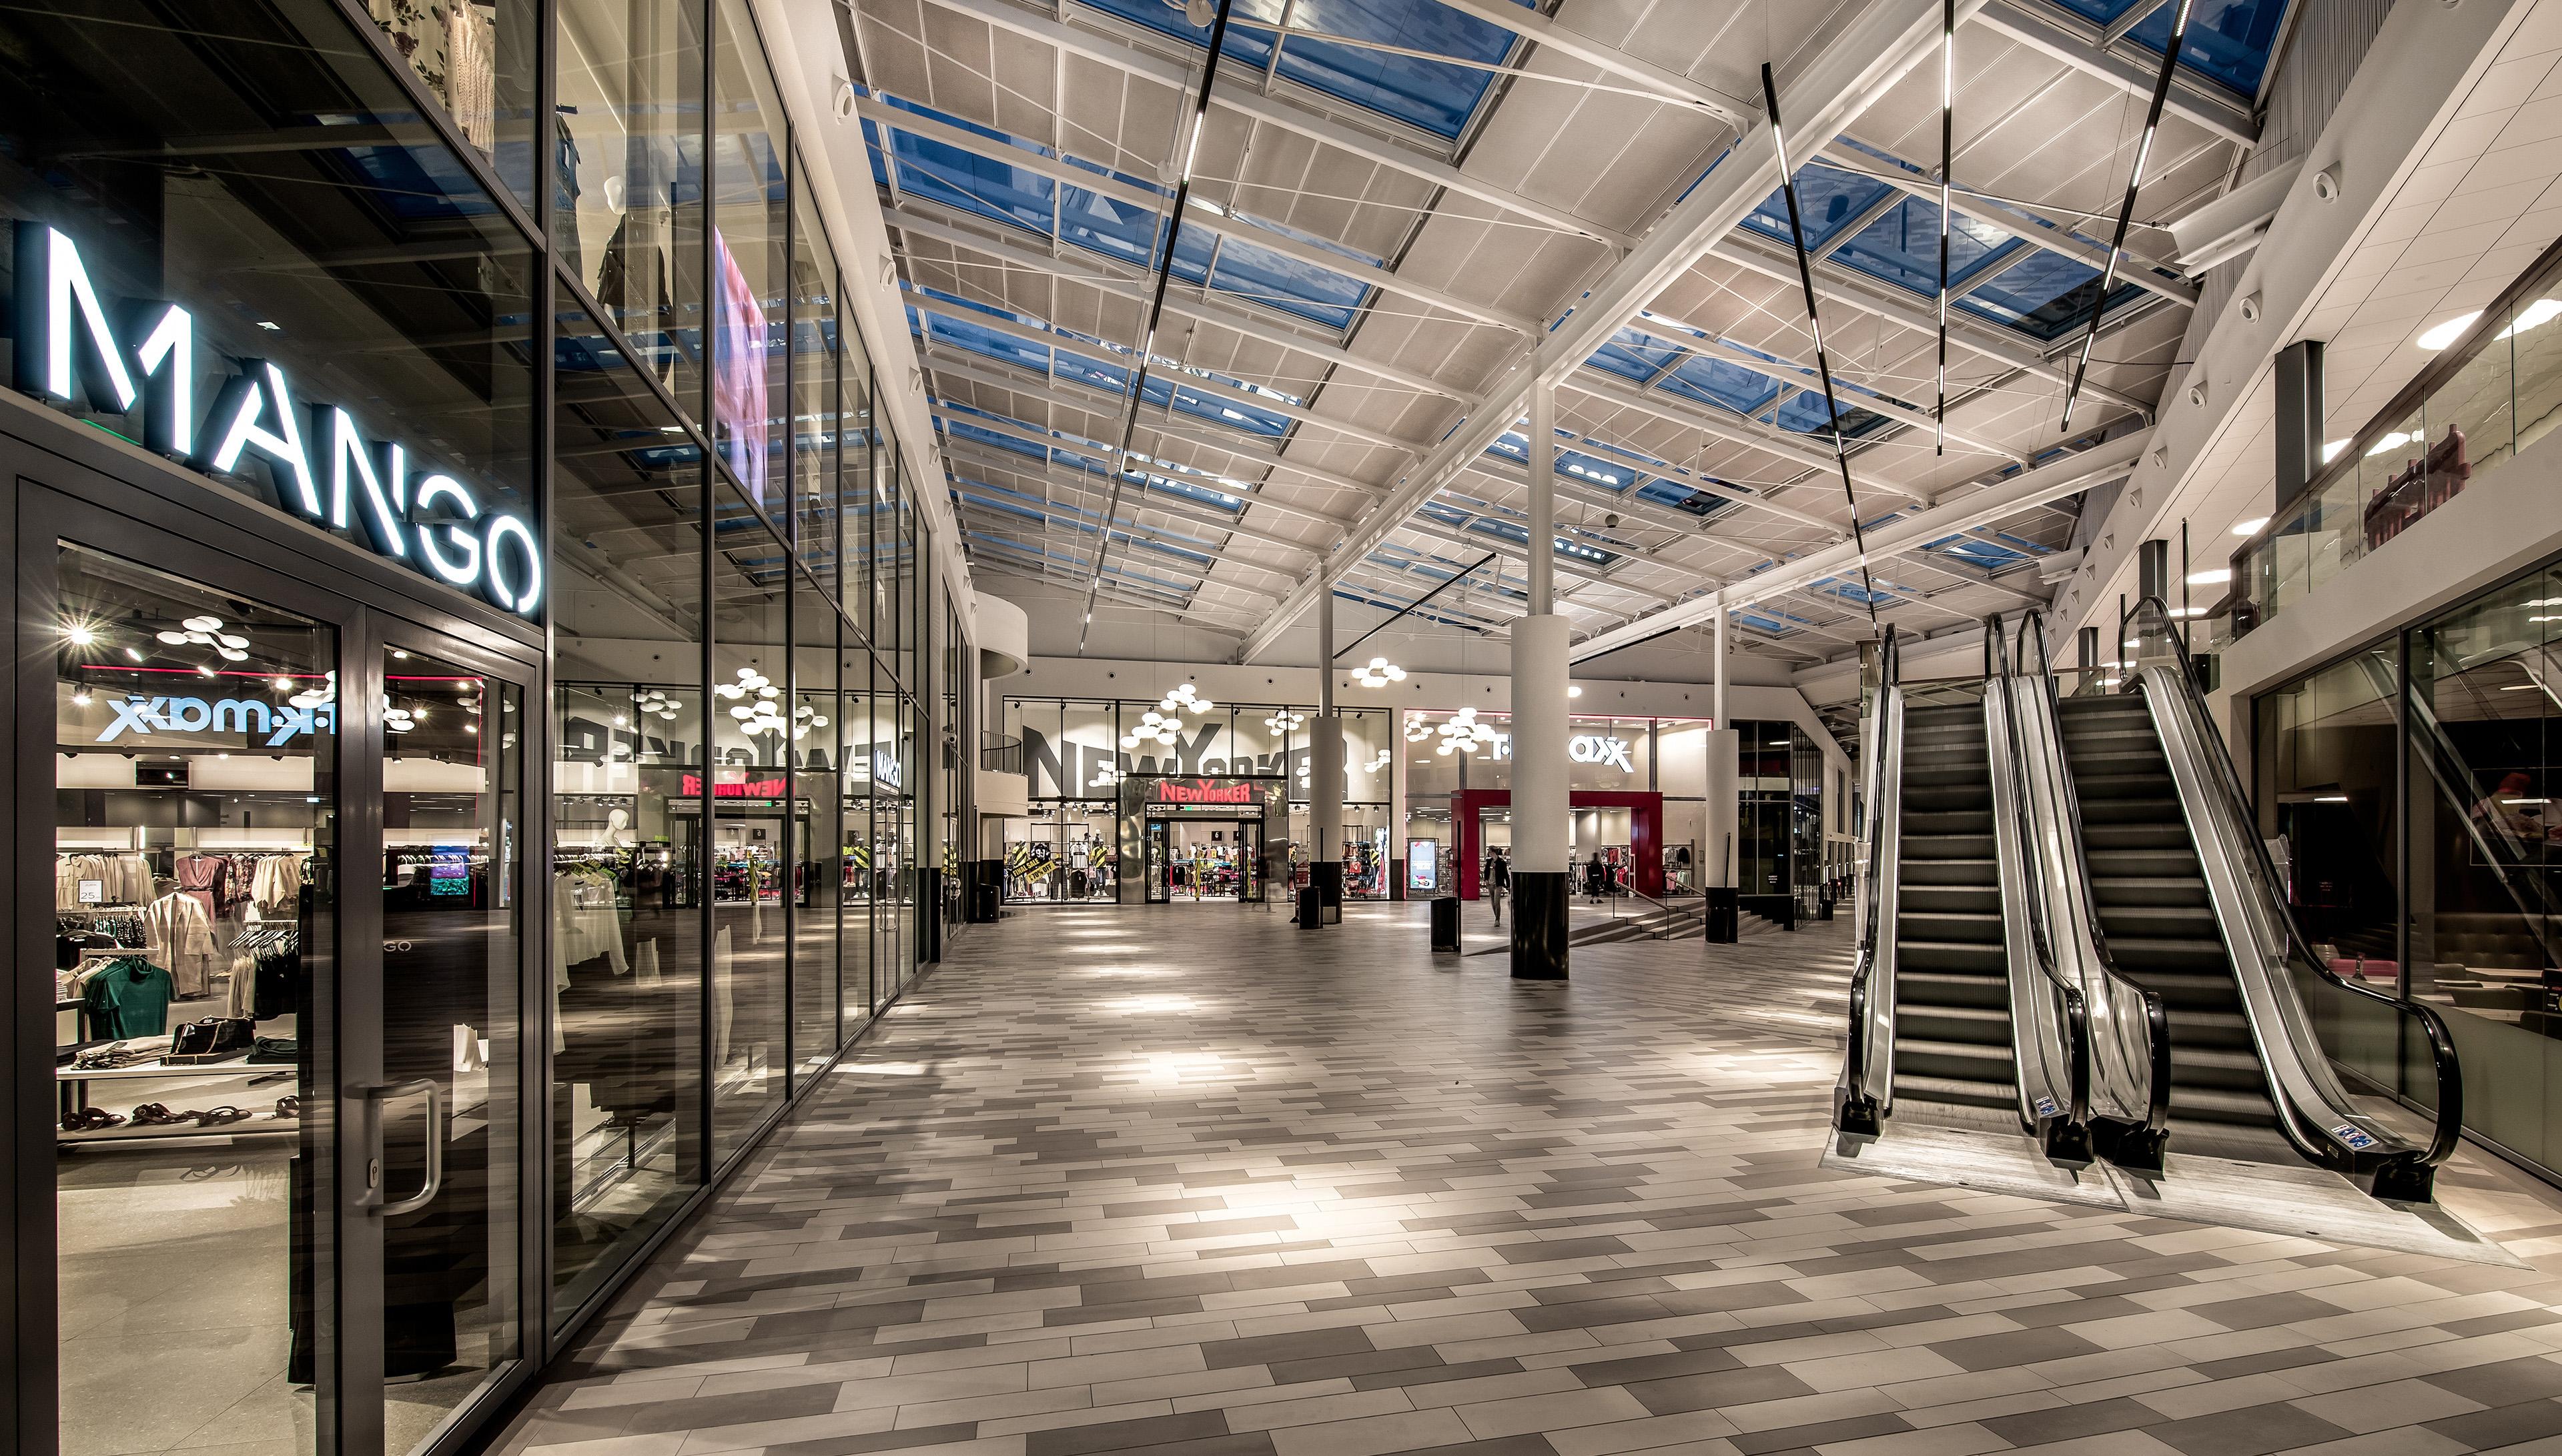 Winkelcentrum Oranjerie